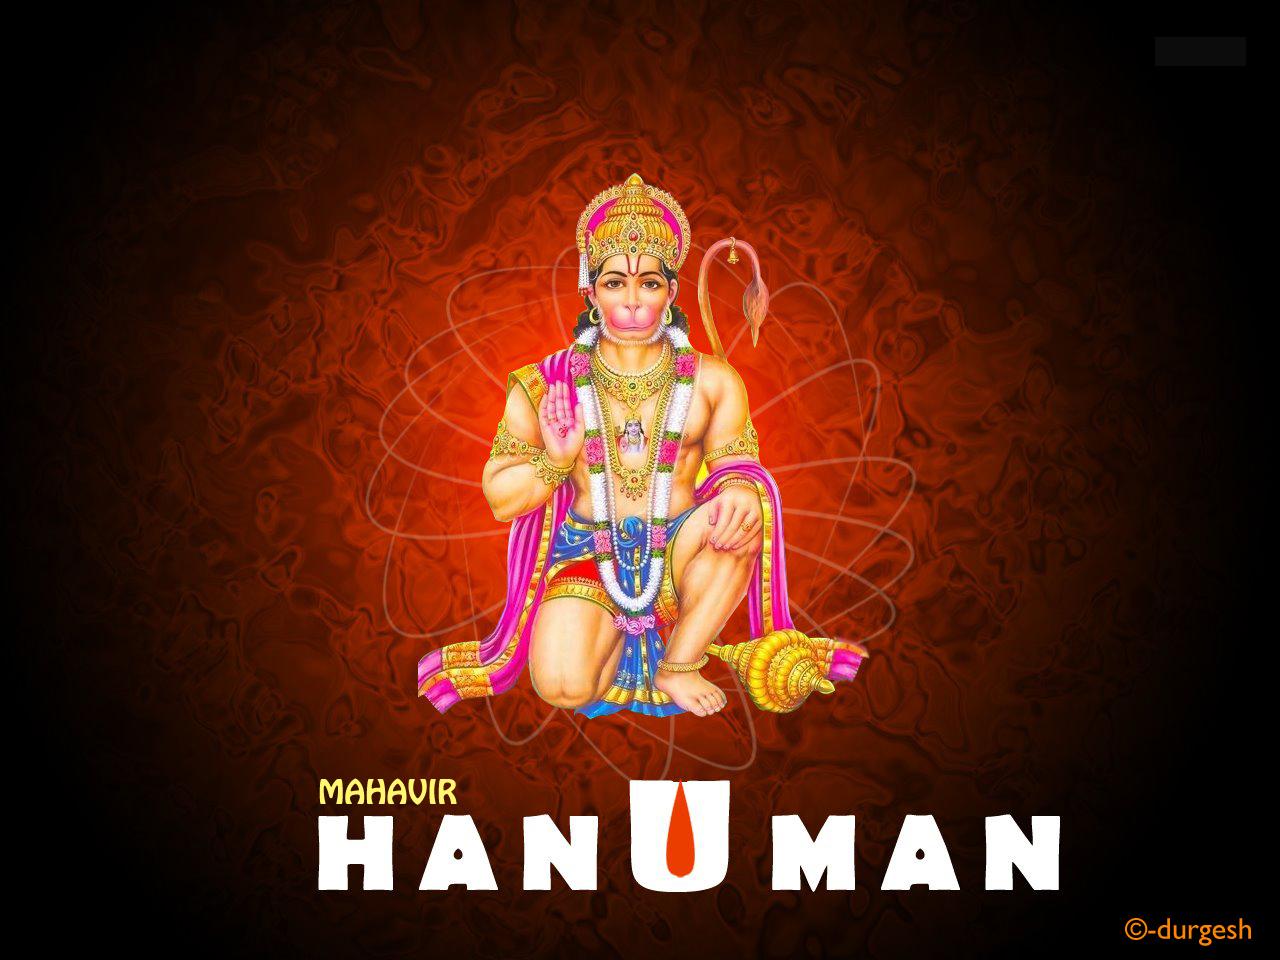 Most Popular Videos: Lord Hanuman Aarti & Hanuman Chalisa